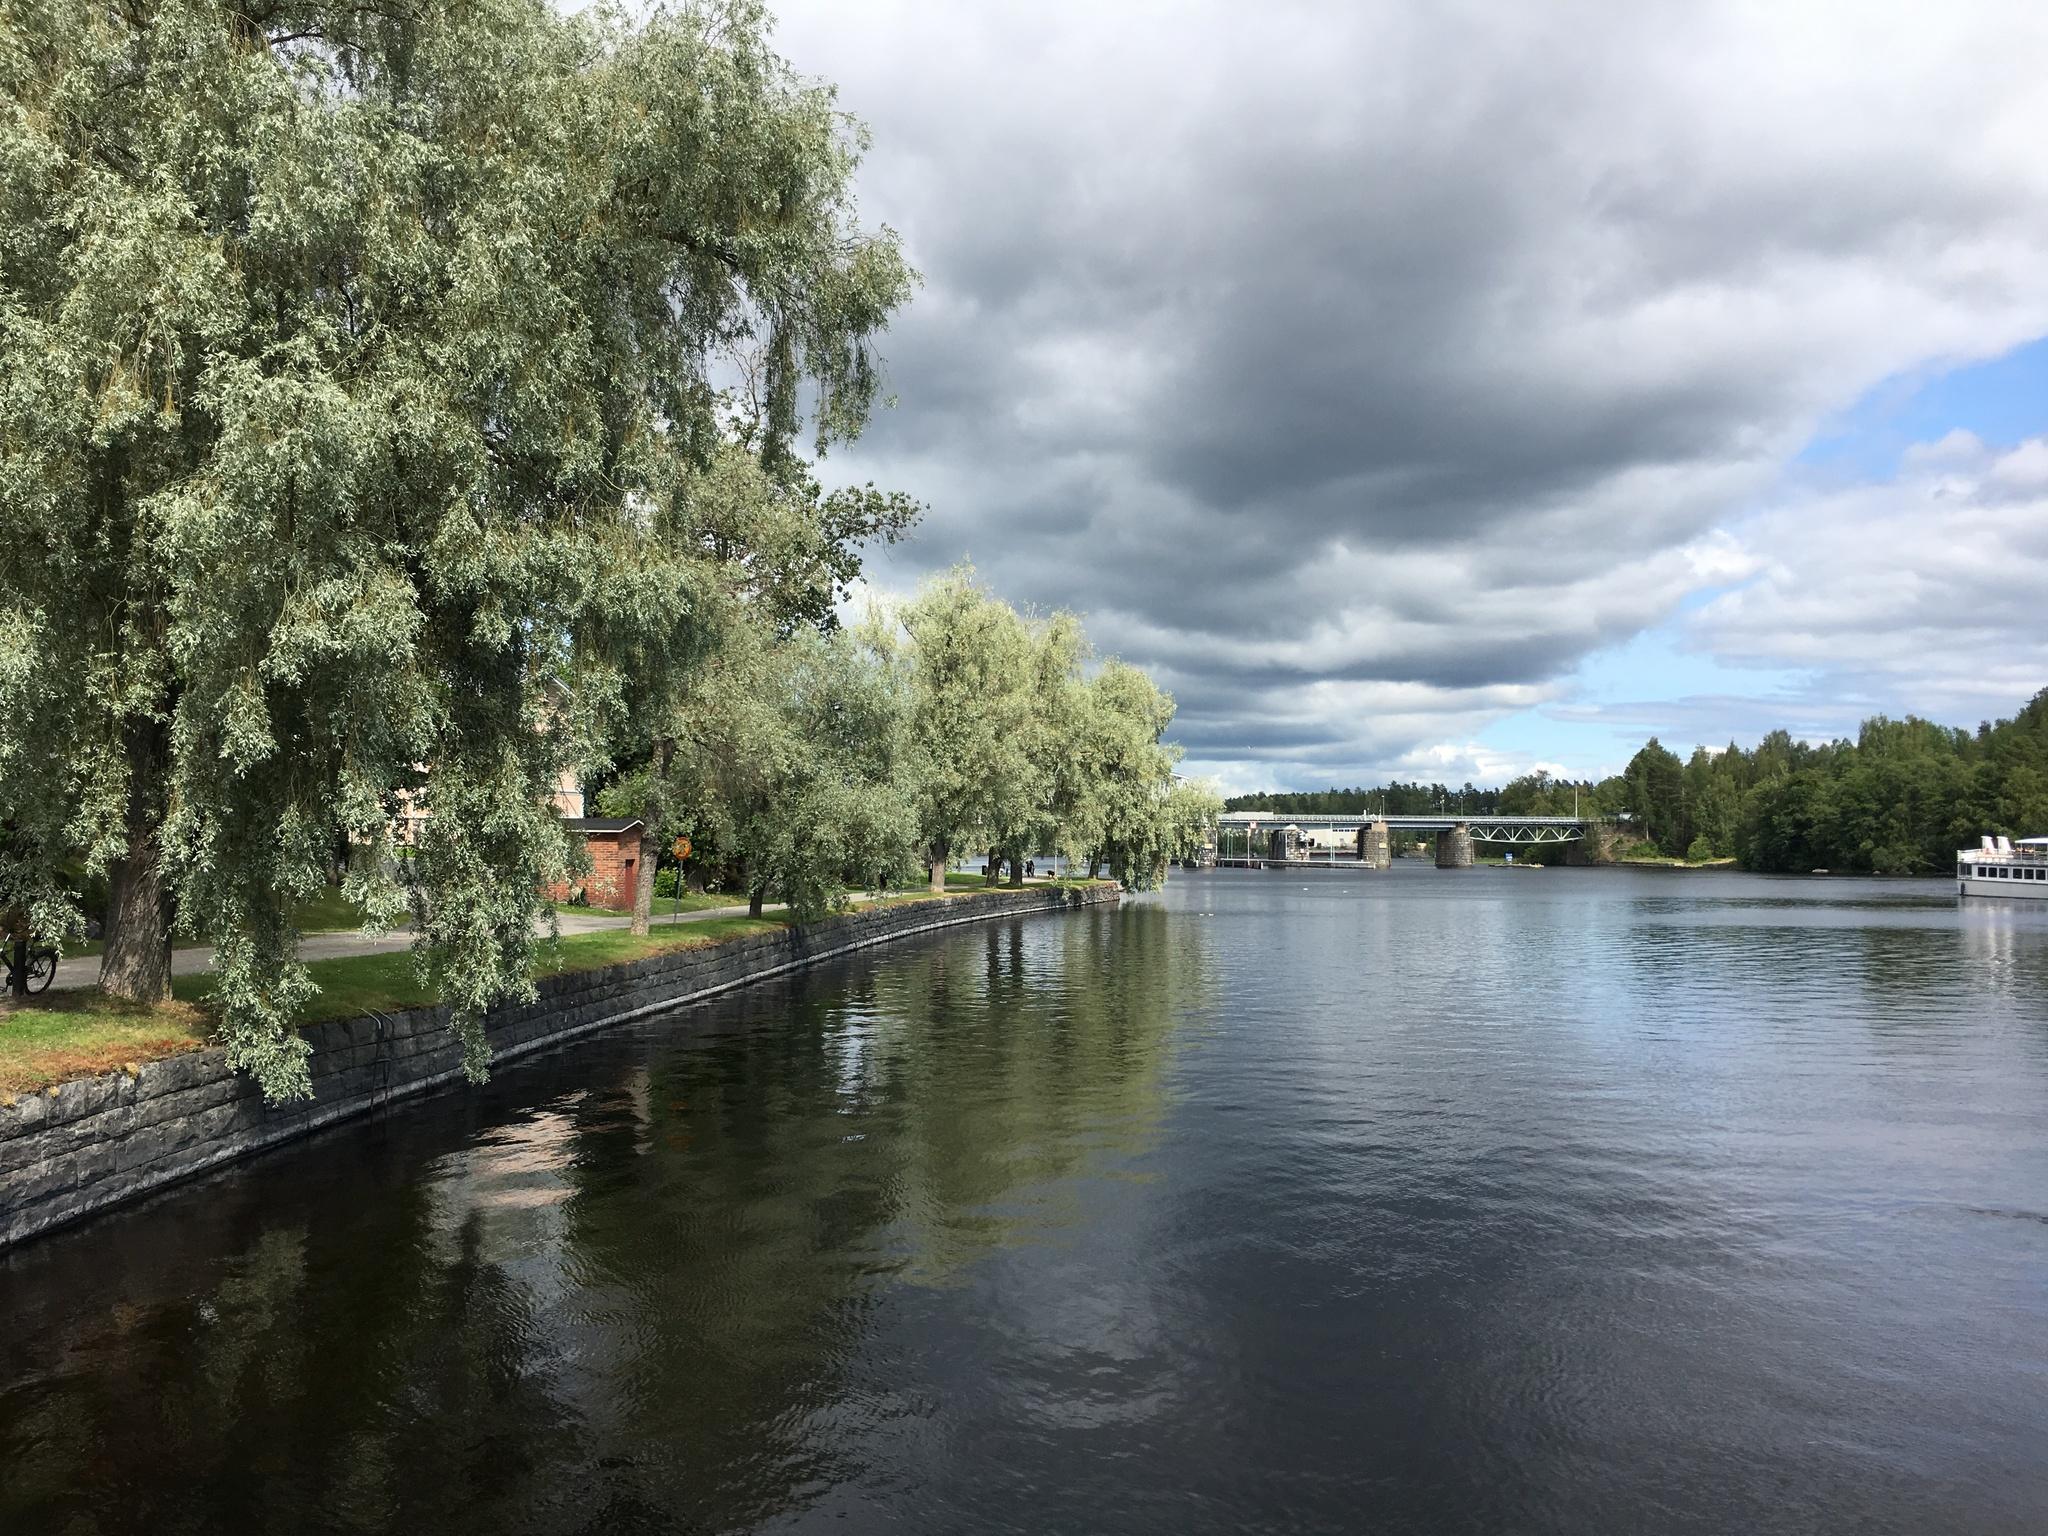 Обои месяц, финляндия. Природа foto 18